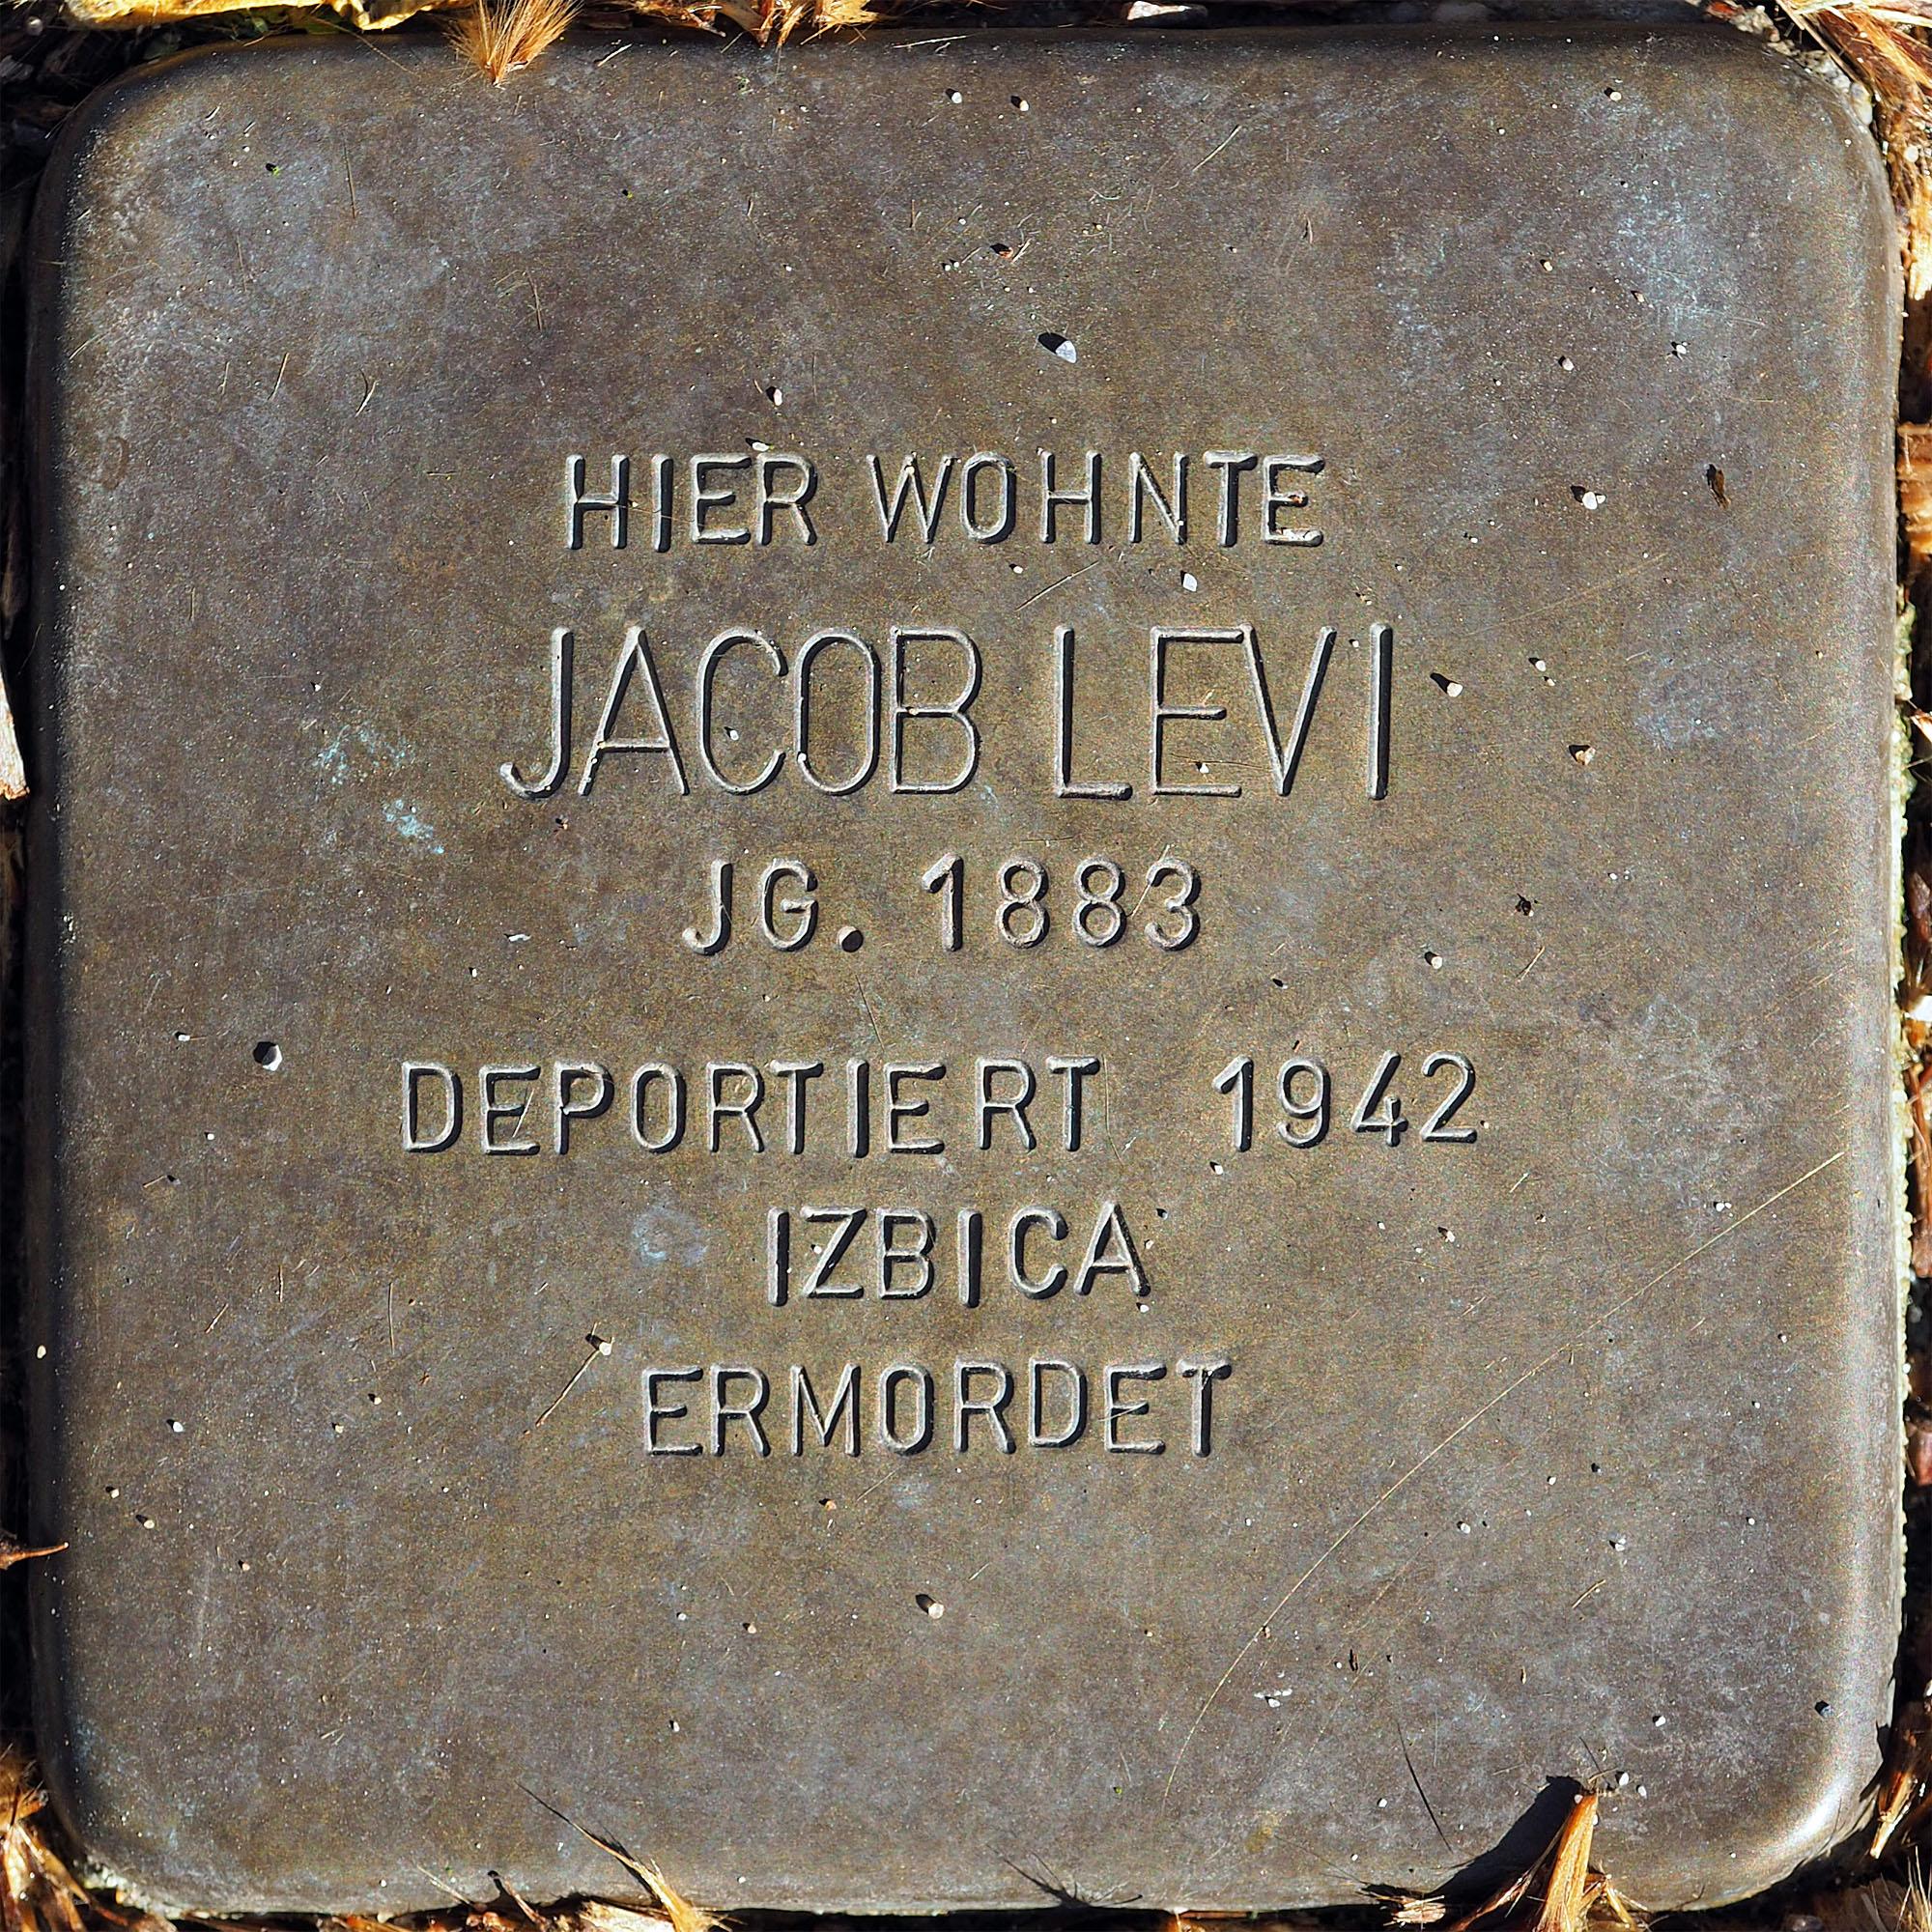 Datei:Stolpersteine MG Levi Jacob.jpg – Wikipedia